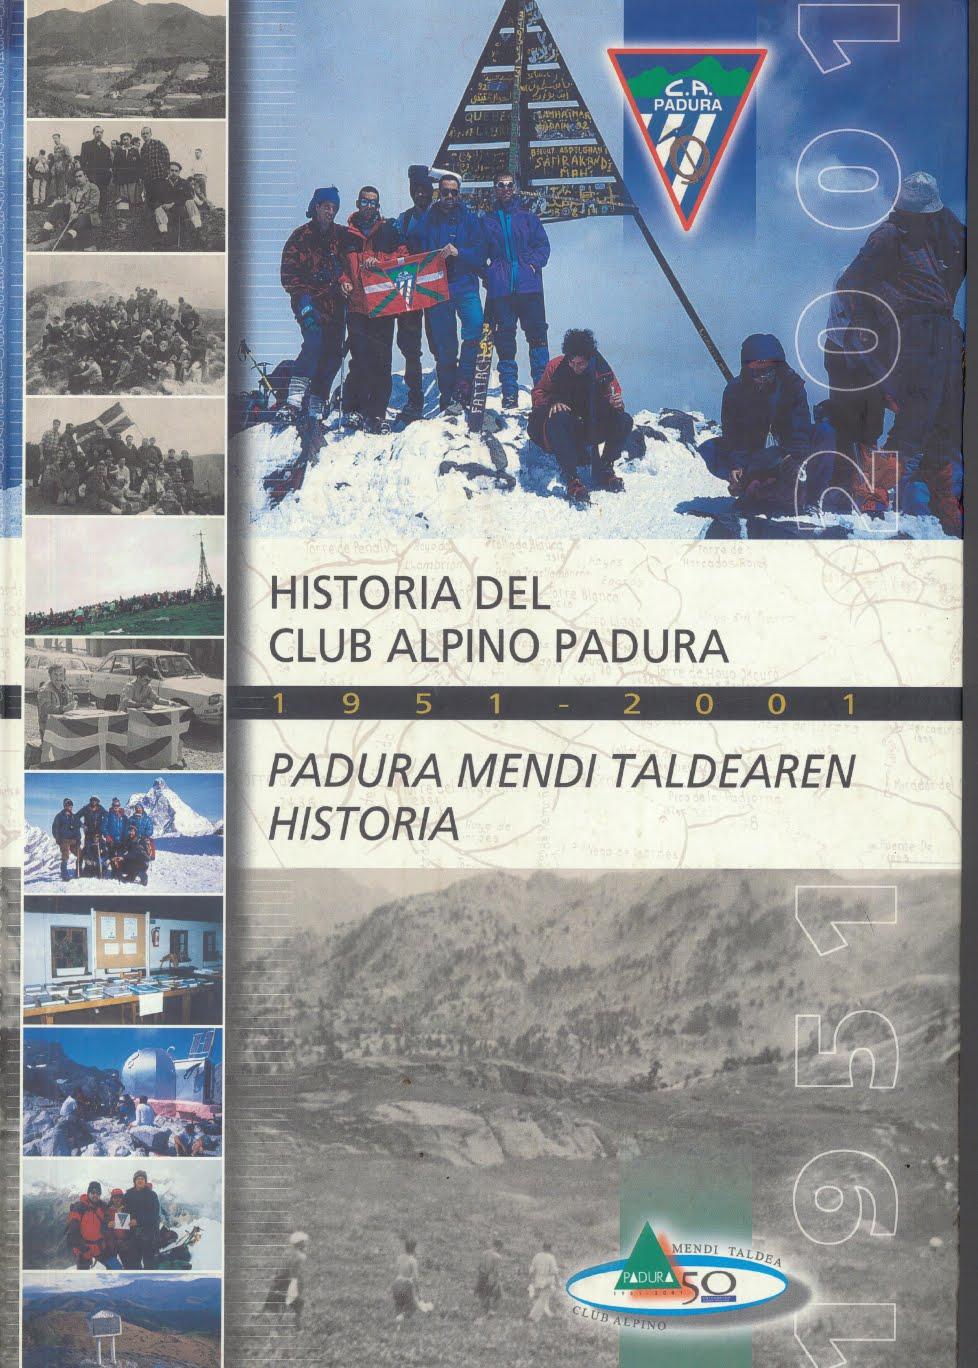 LIBRO (FORMATO DIGITAL) DE LA HISTORIA DEL CLUB ALPINO PADURA 1951 - 2001